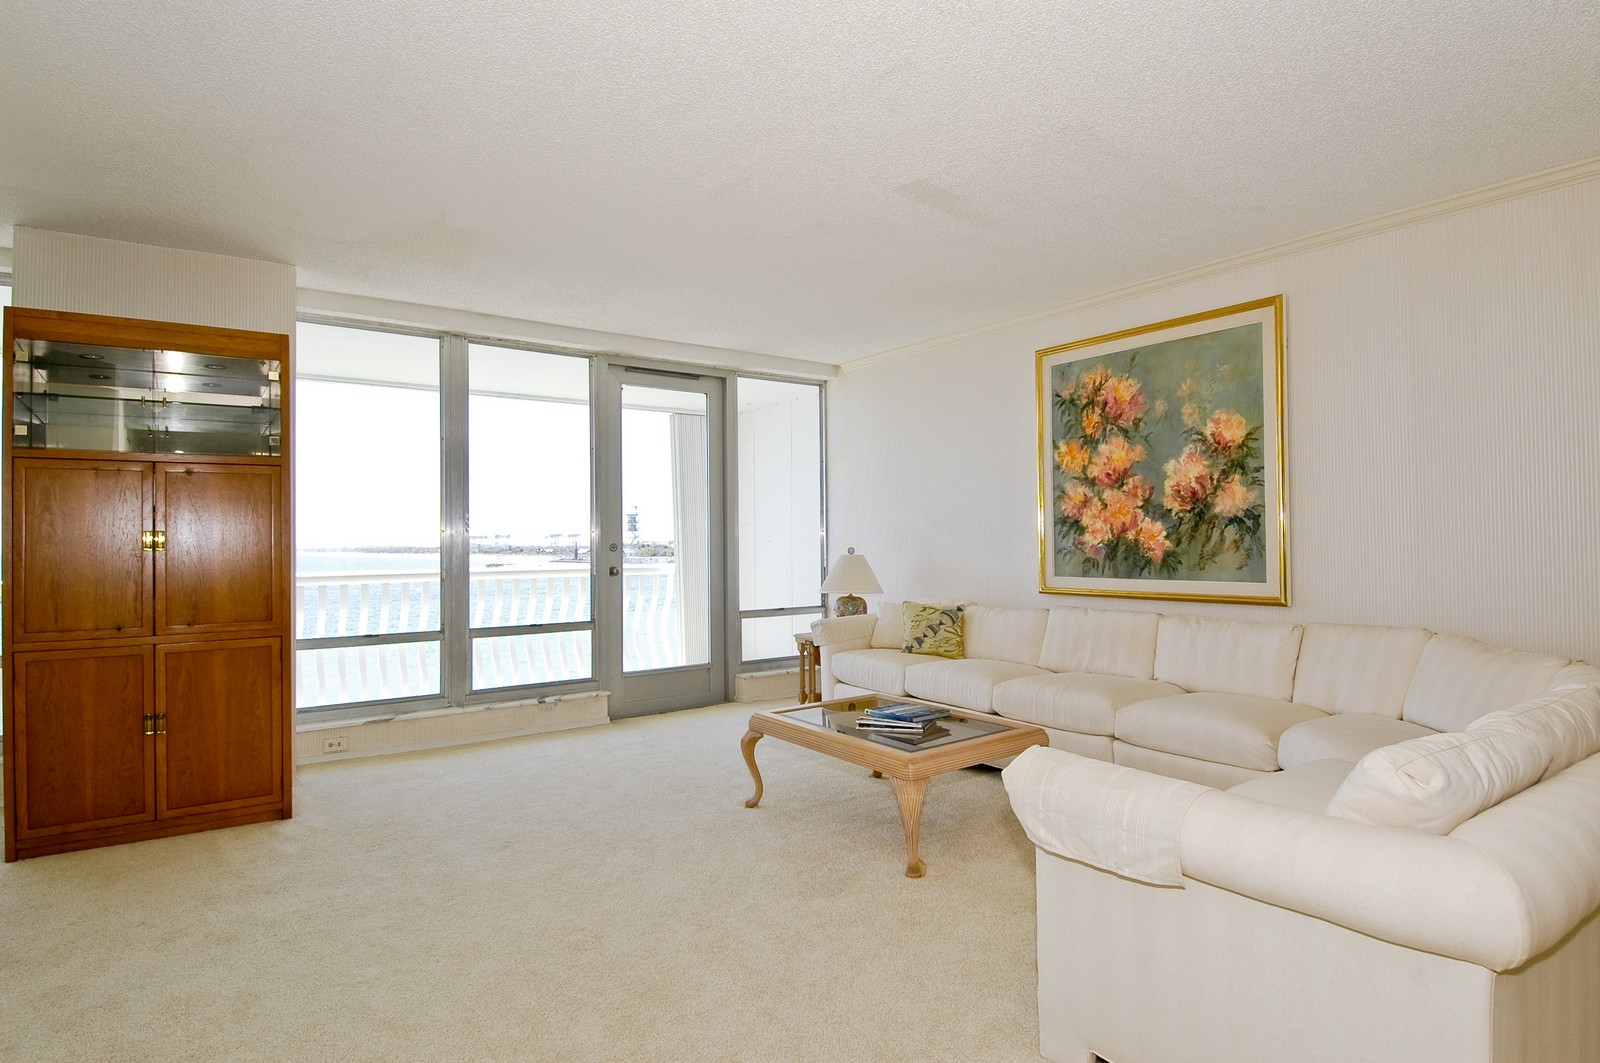 Real Estate Photography - 2200 S Ocean Ln, 206, Fort Lauderdale, FL, 33316 - Living Room